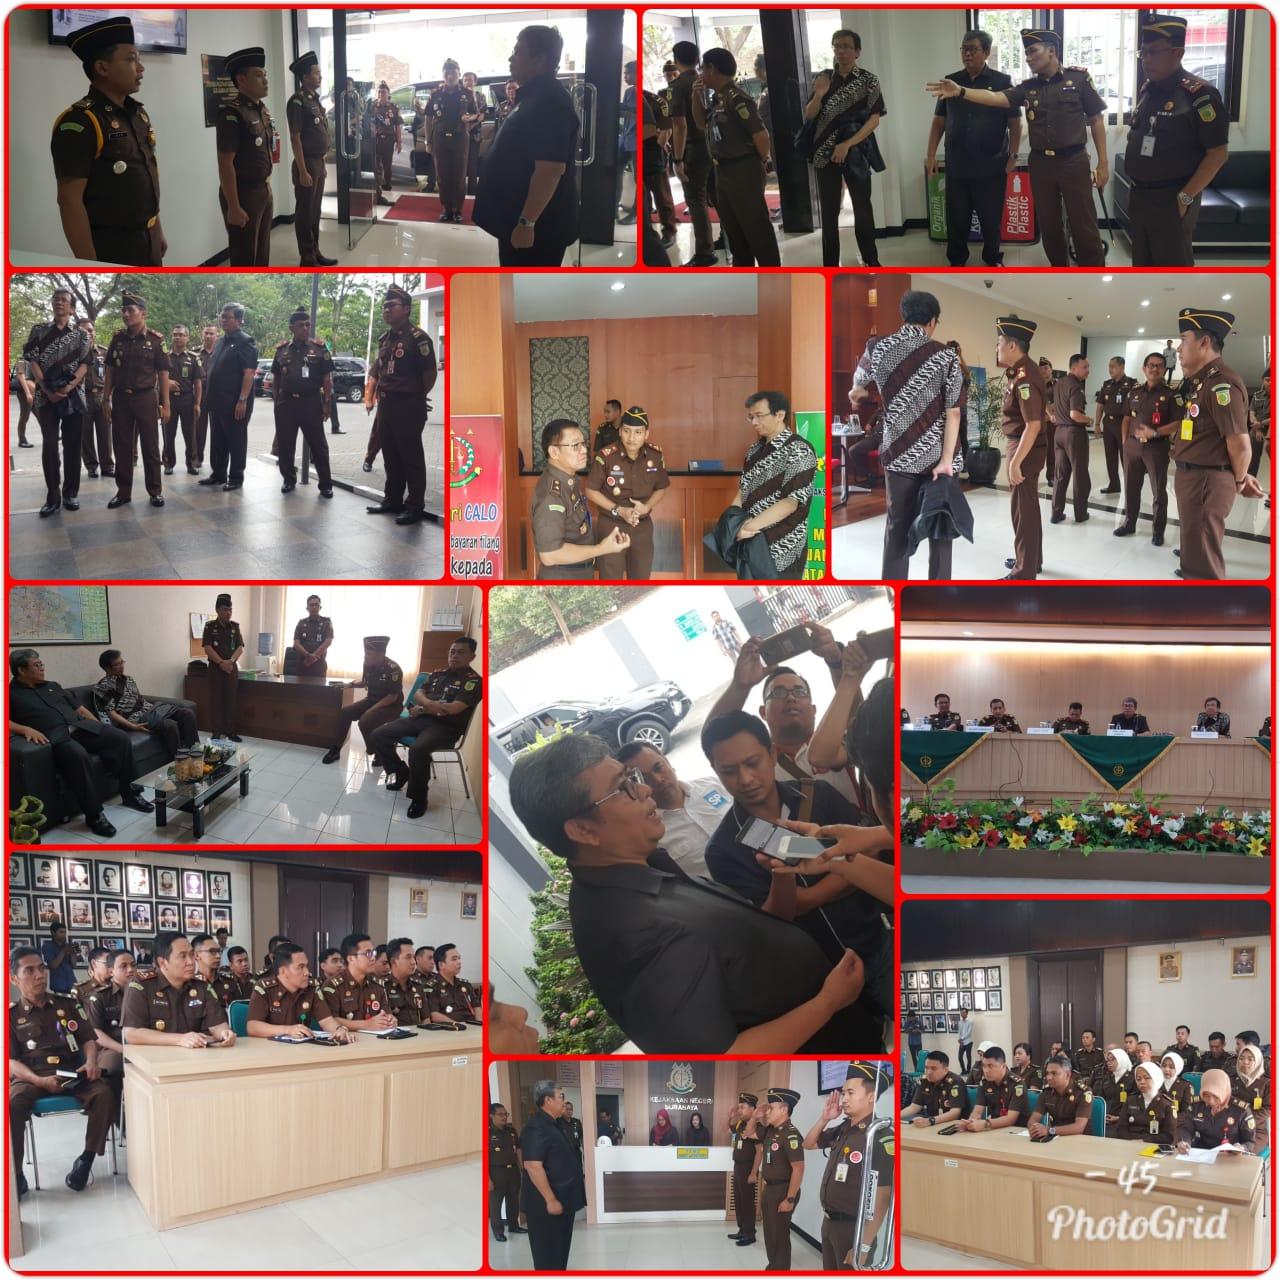 Kunjugan kerja dalam rangka evaluasi pelaksanaan pembangunan wilayah bebas korupsi WBK di Kejaksaan Negeri Surabaya 07-11-2018